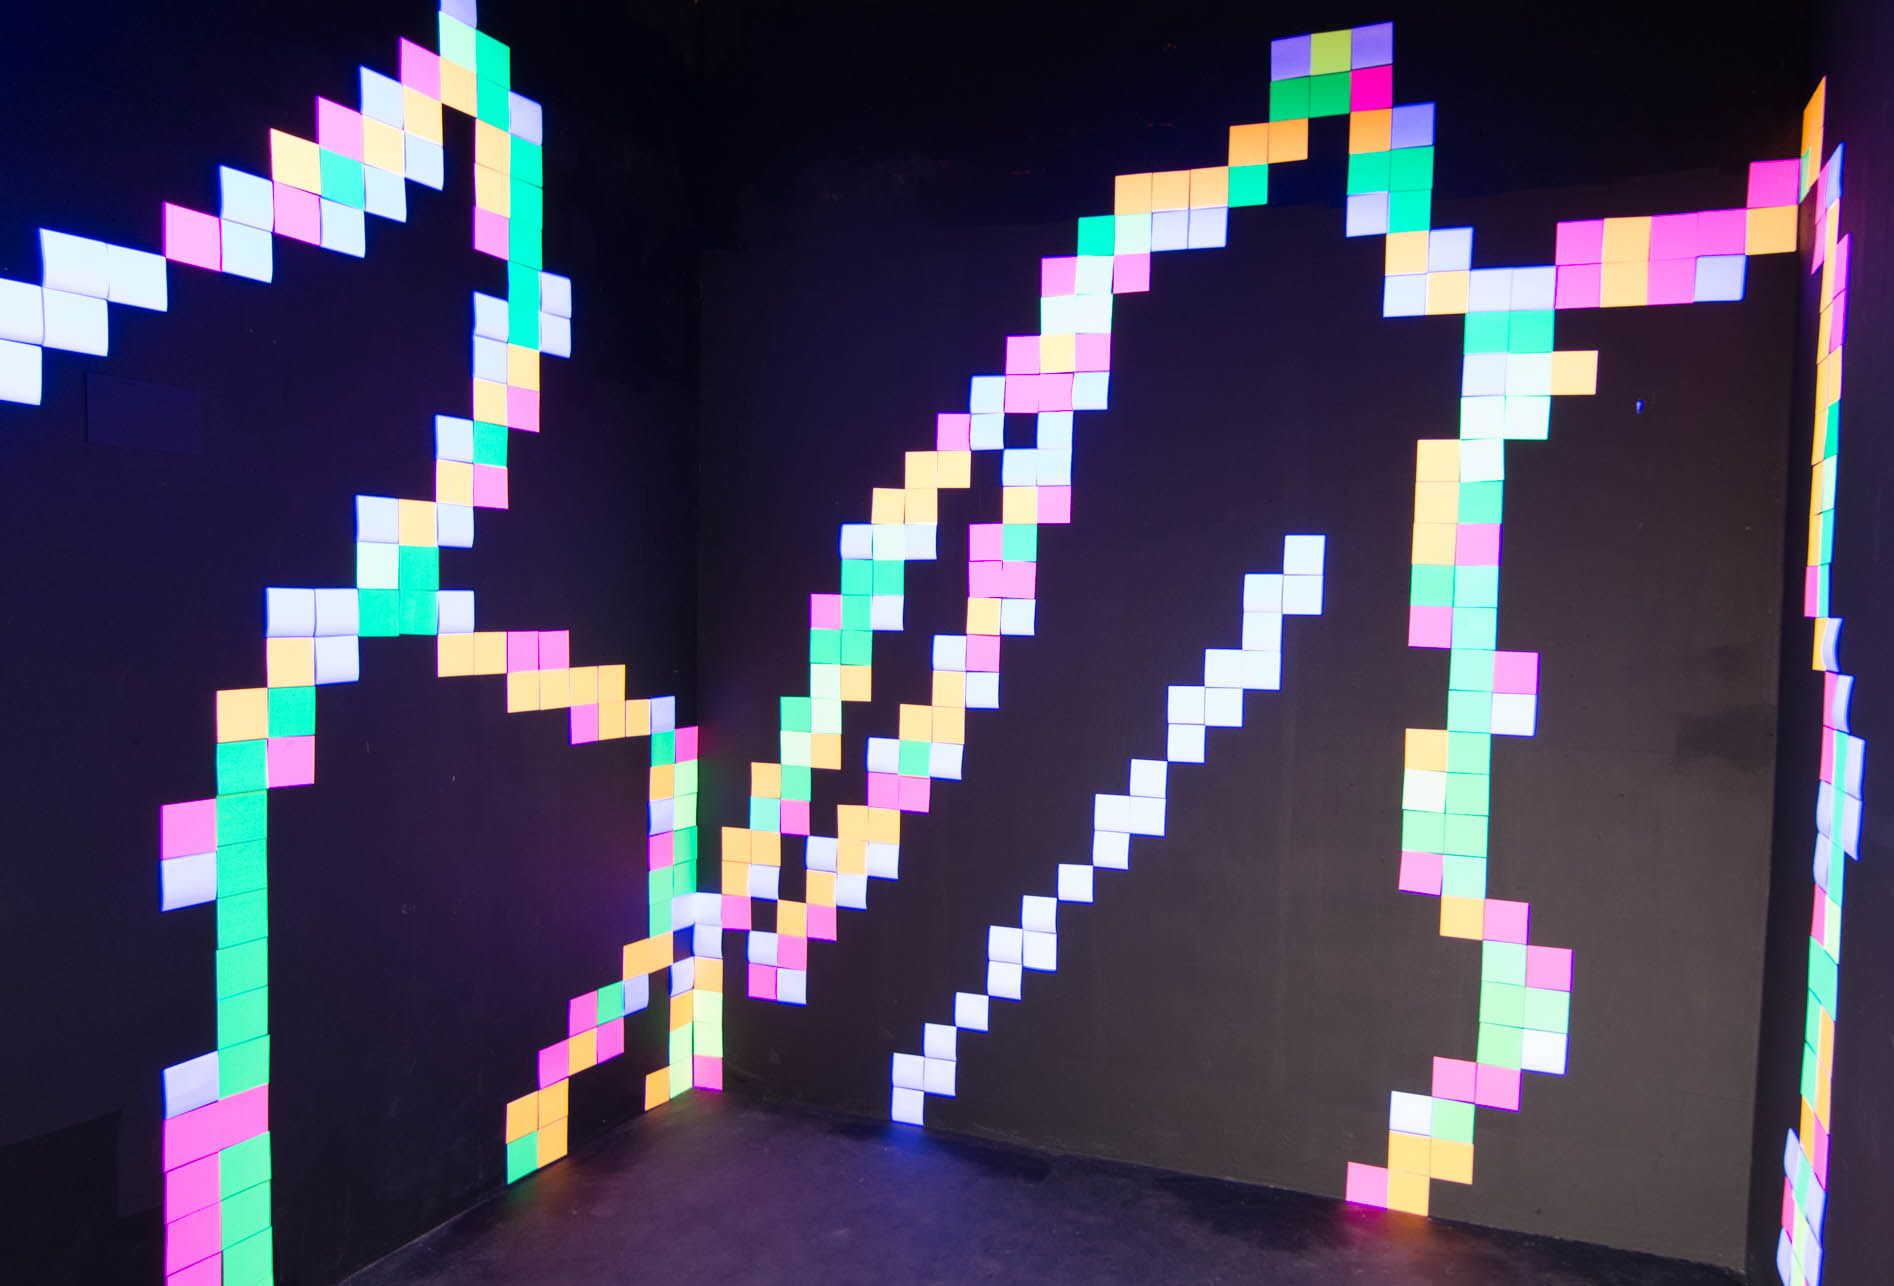 Fluro Pixel Squares, image 7a -white light